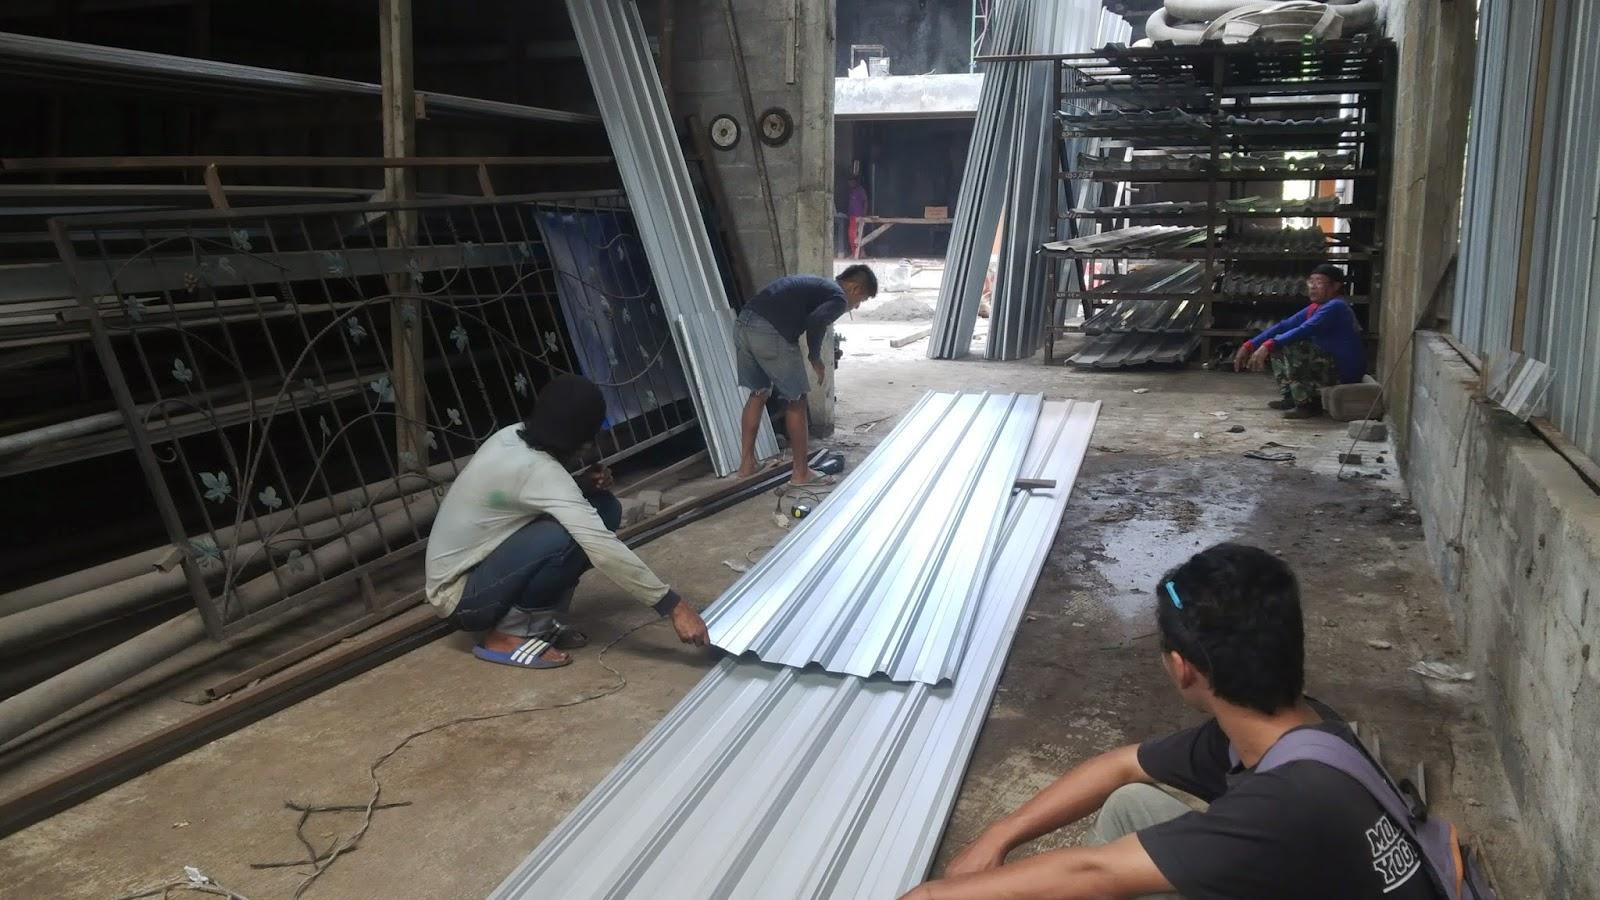 kanopi baja galvanis kontraktor yogyakarta: tukang las jogja